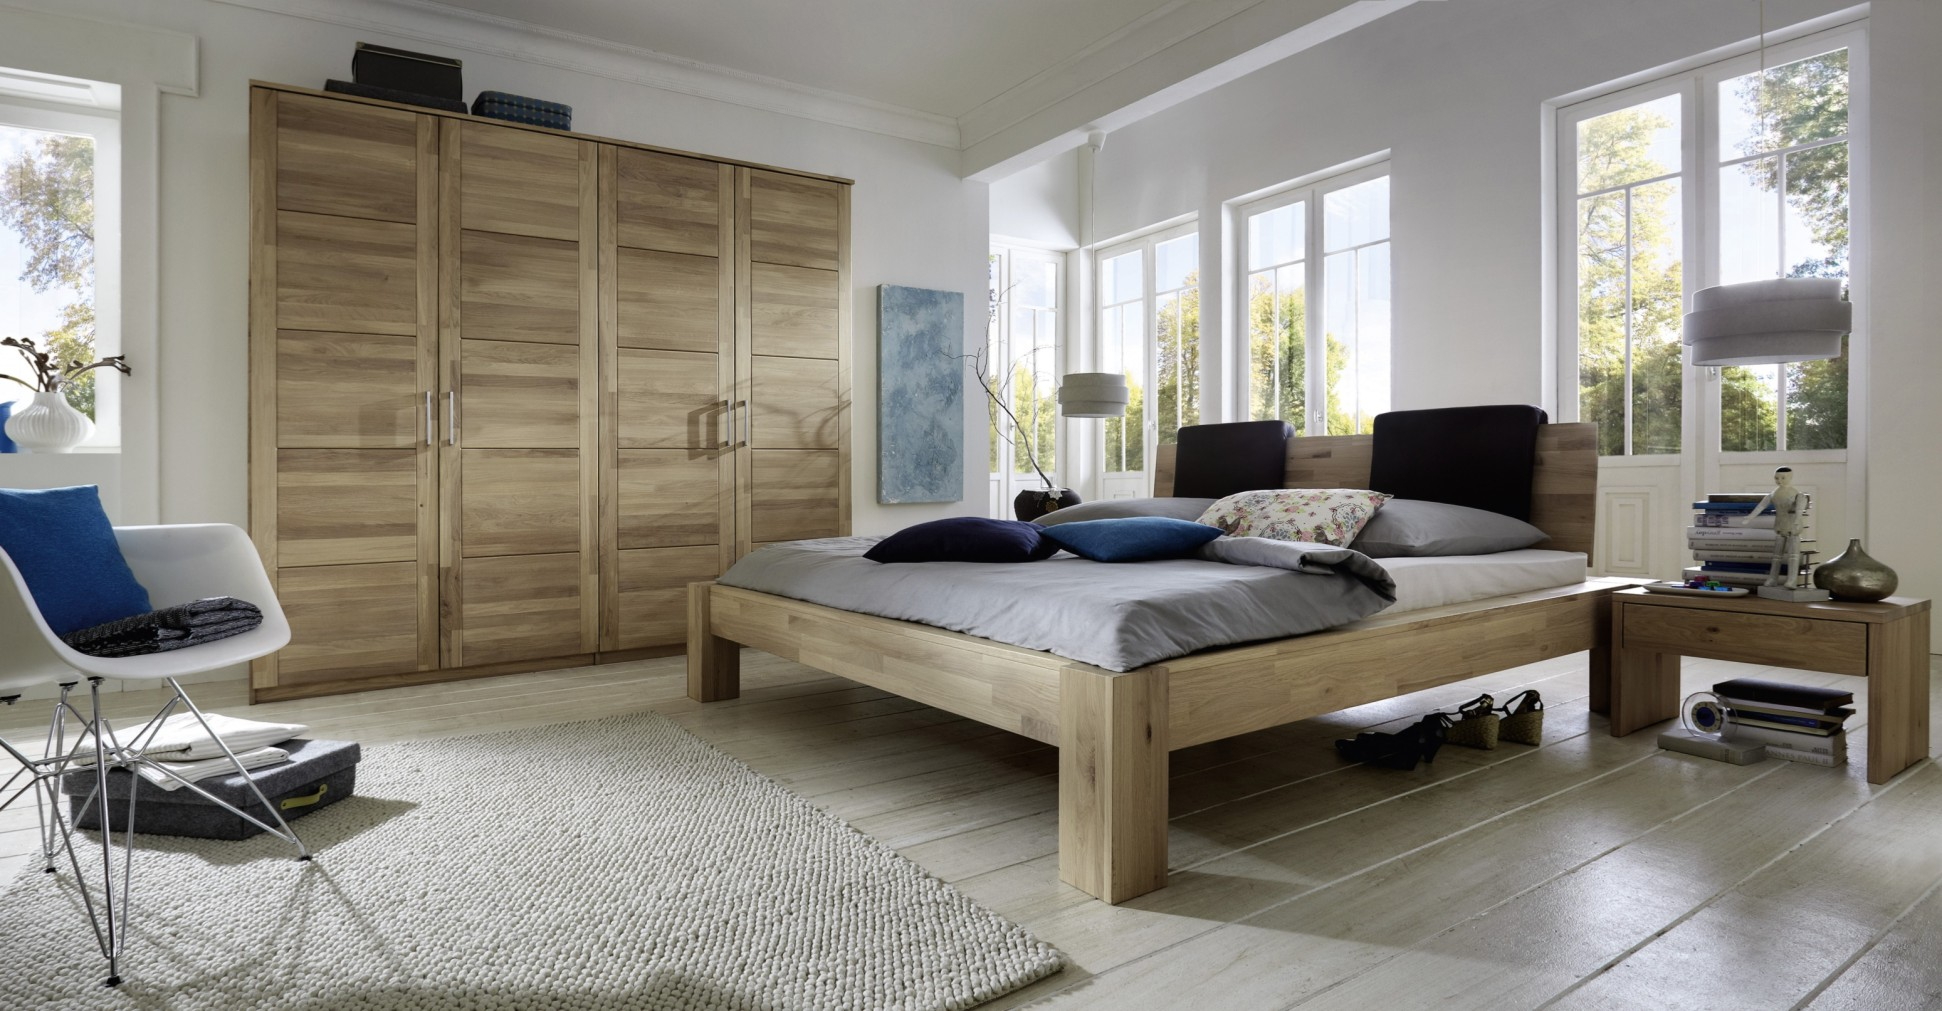 Full Size of Massivholz Schlafzimmer Naturbelassene Massivholzbetten Massivholzschlafzimmer In Mit überbau Günstige Sitzbank Stuhl Sessel Stehlampe Komplett Vorhänge Schlafzimmer Massivholz Schlafzimmer